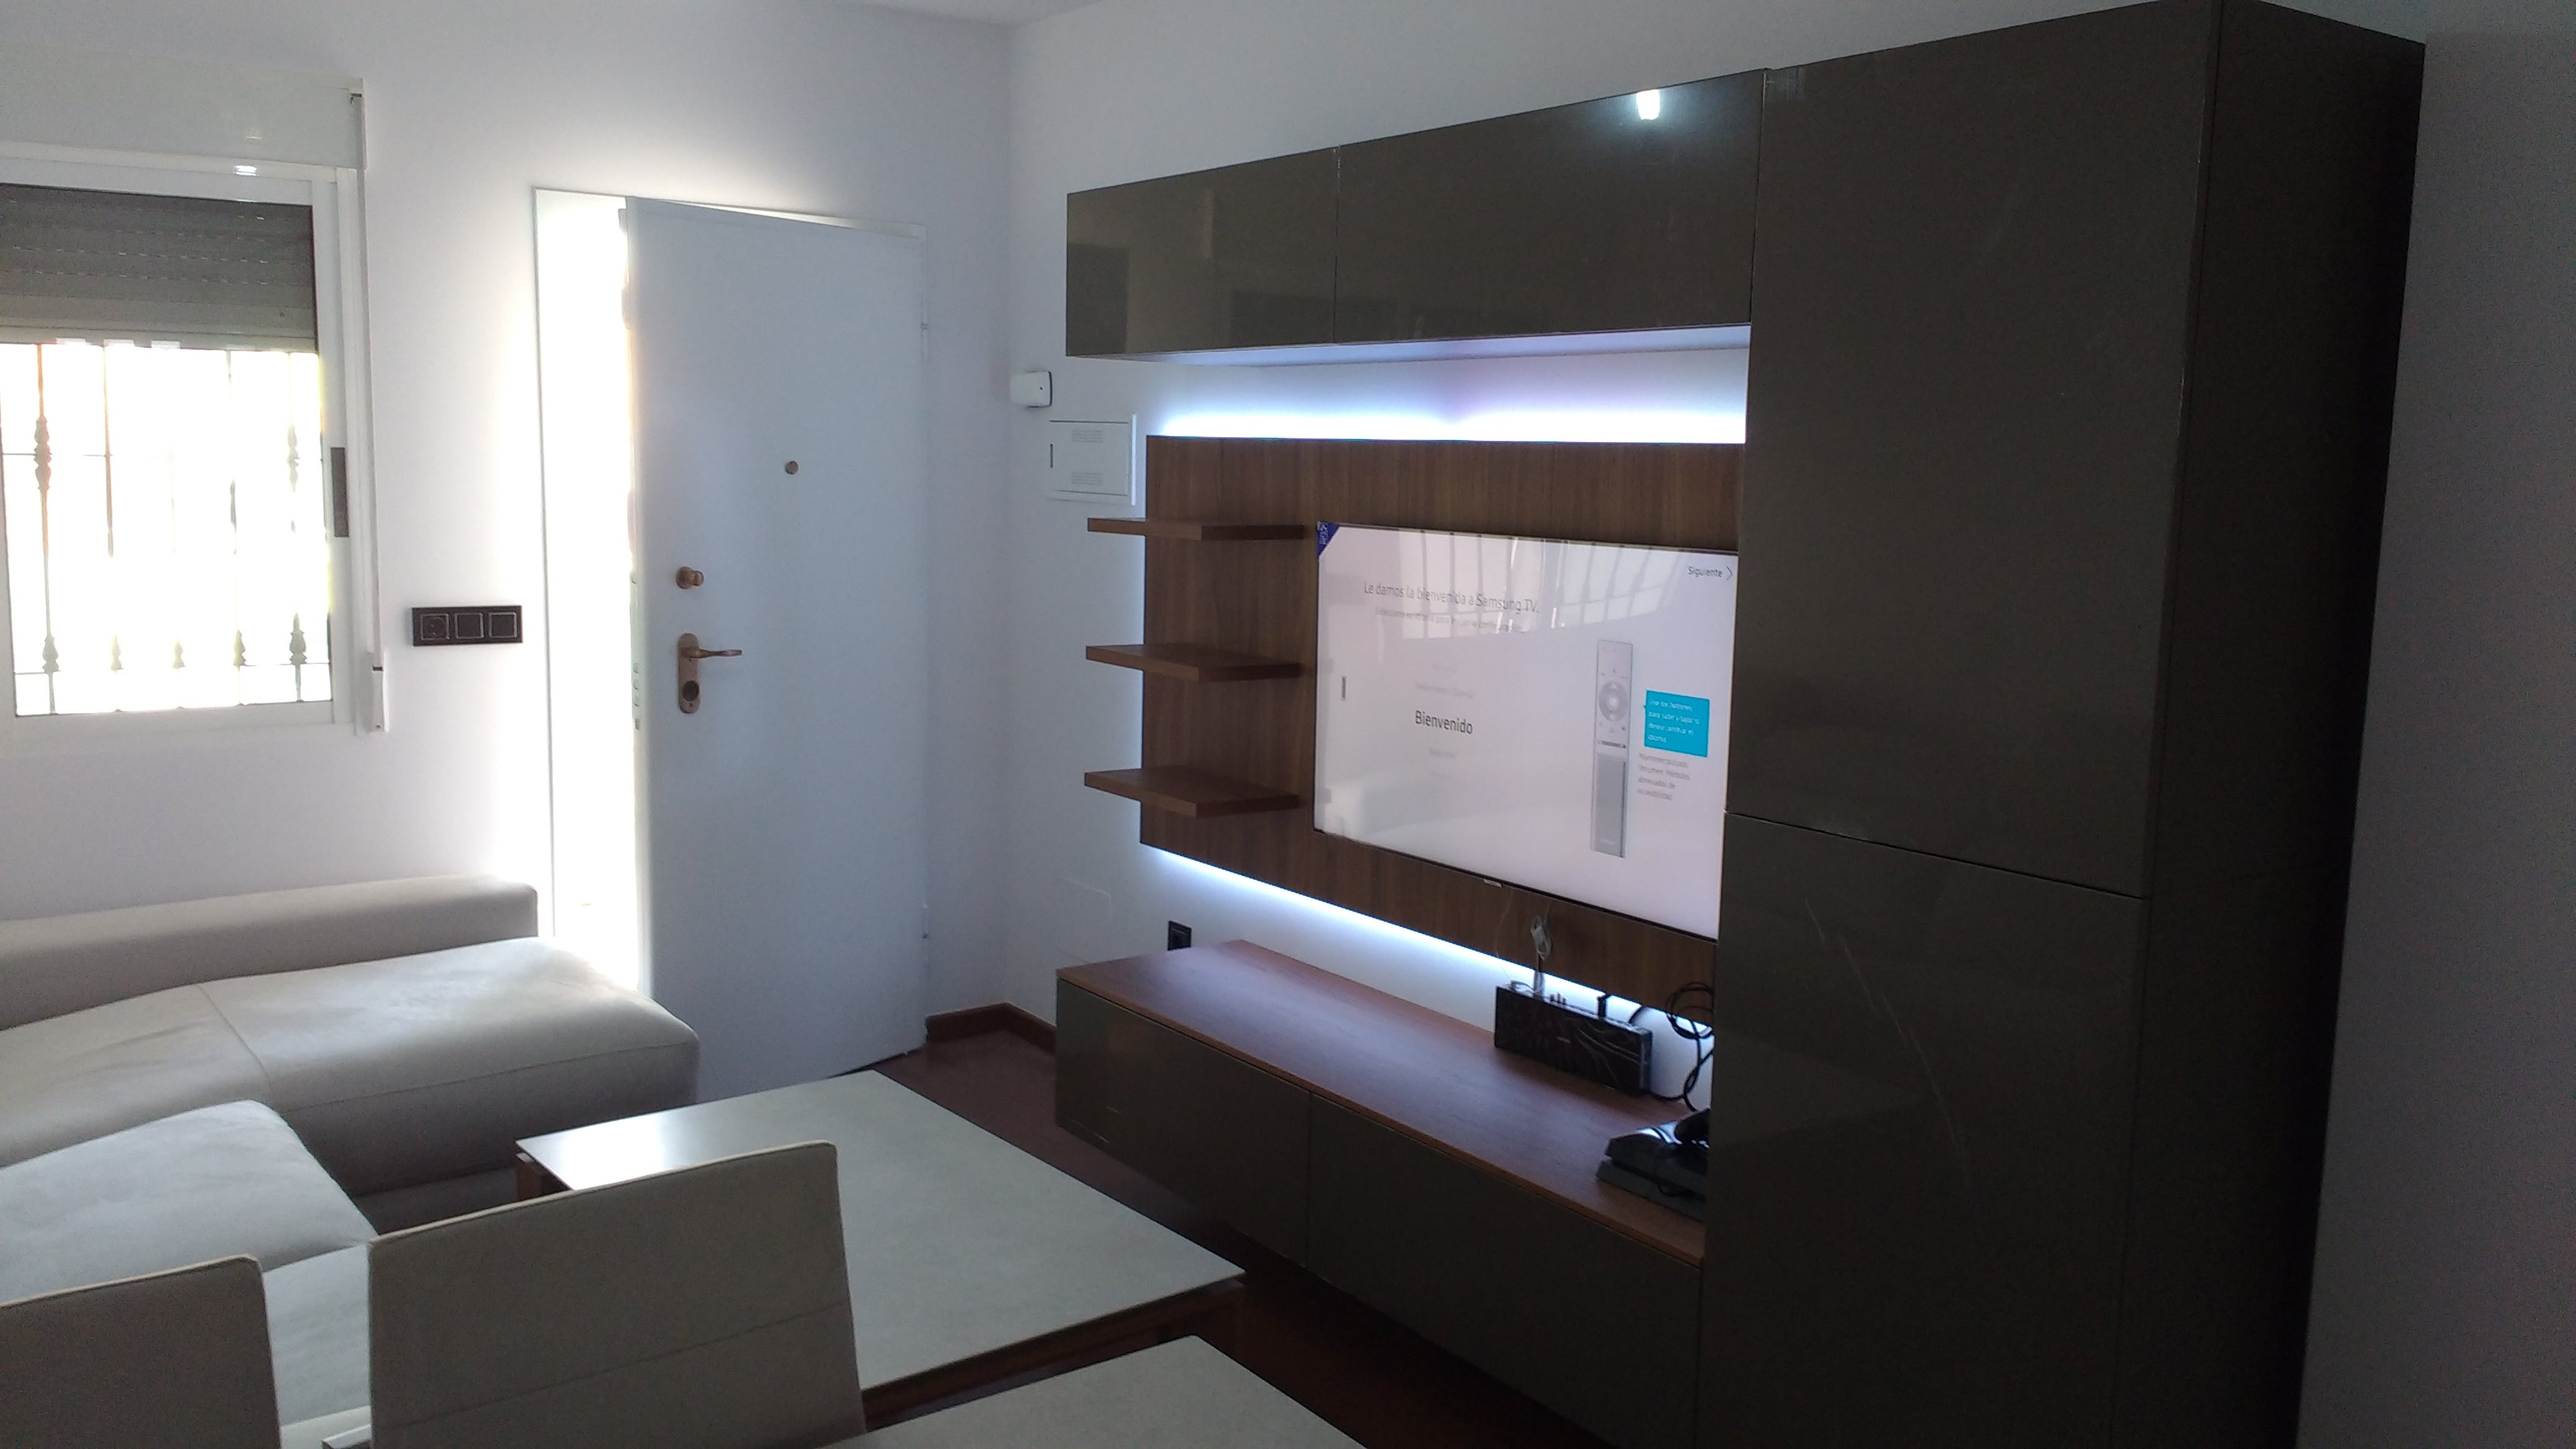 Muebles modernos en Murcia